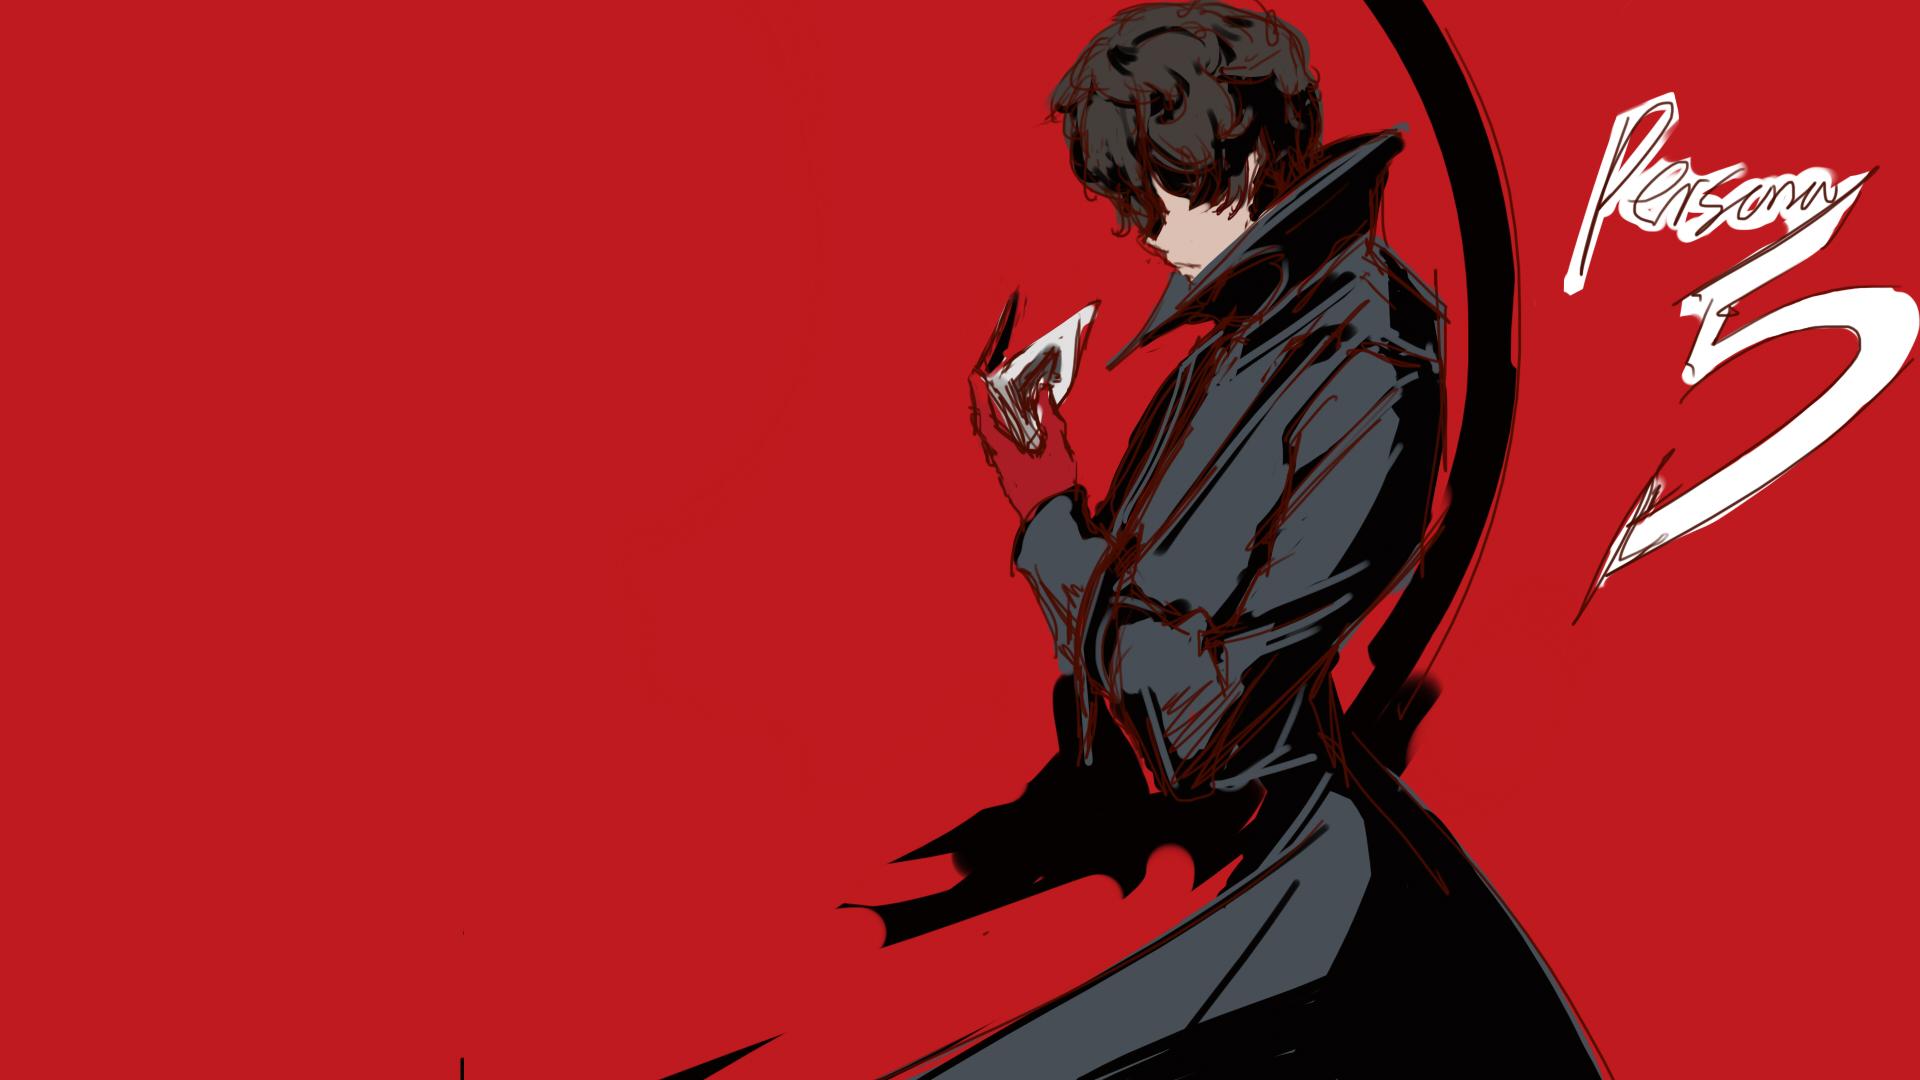 Joker (Persona 5) - Amamiya Ren (Persona 5) - Wallpaper